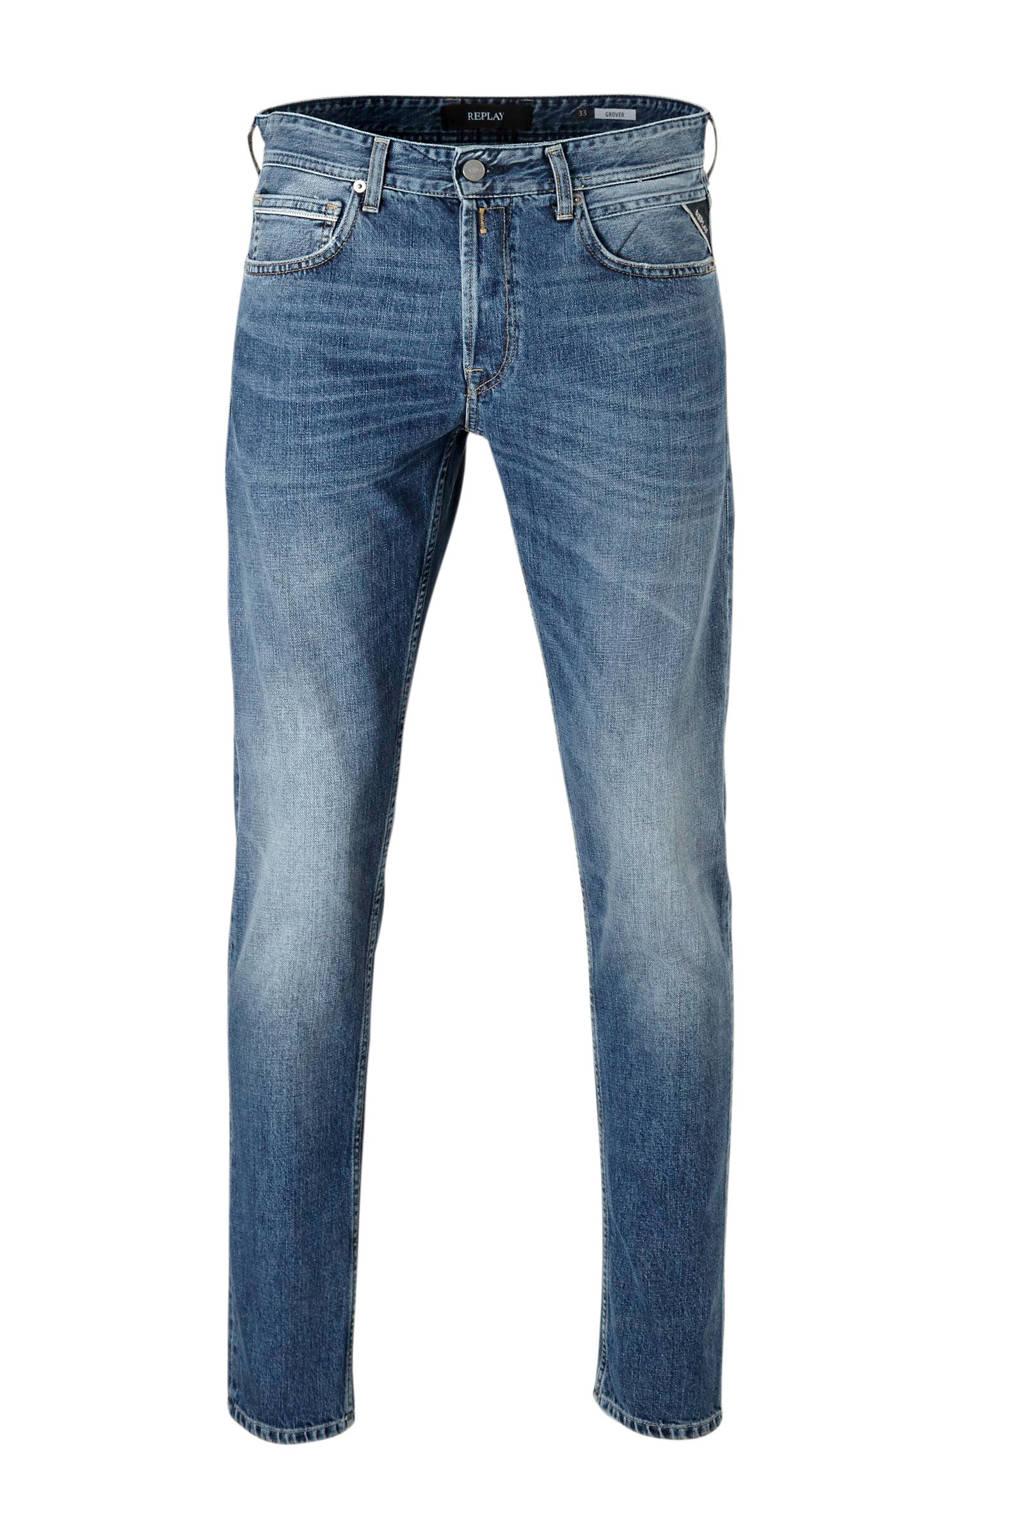 REPLAY regular fit jeans Grover, Light denim